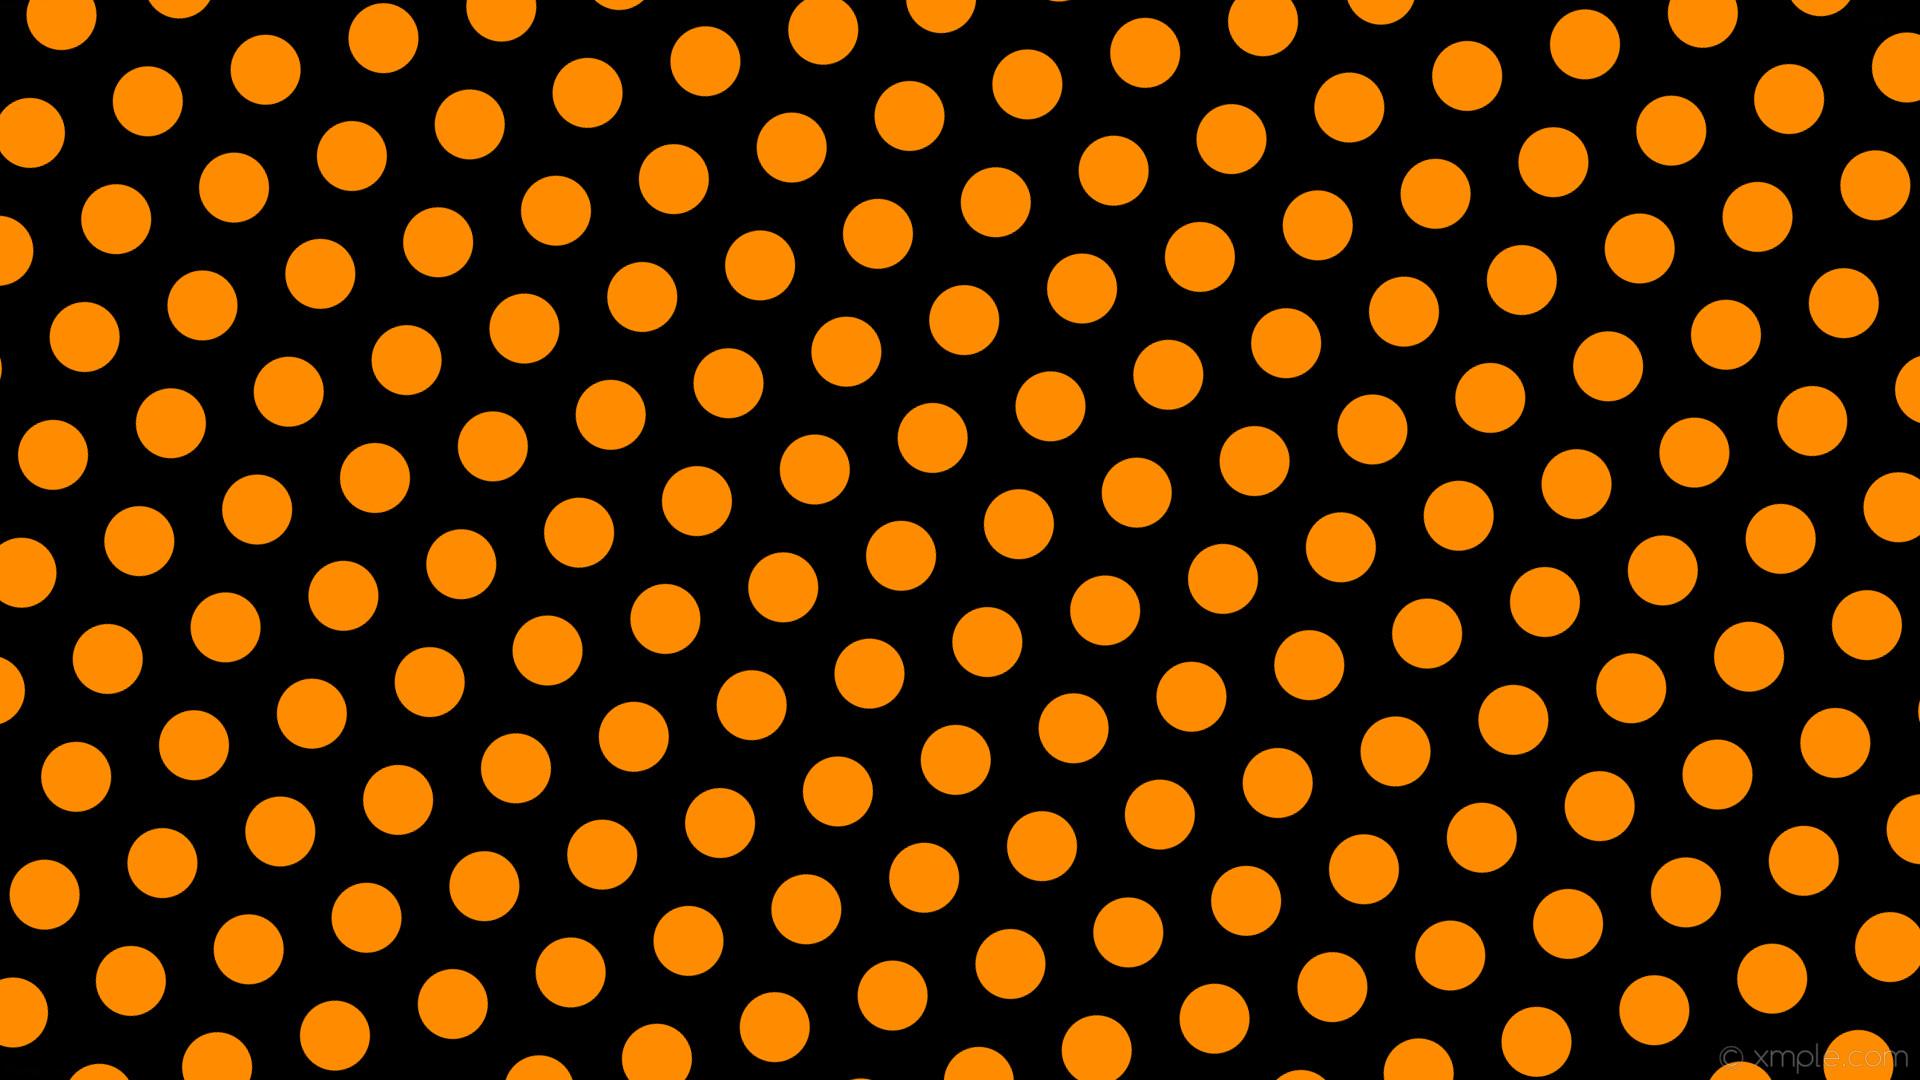 wallpaper orange black hexagon polka dots dark orange #000000 #ff8c00  diagonal 15° 70px